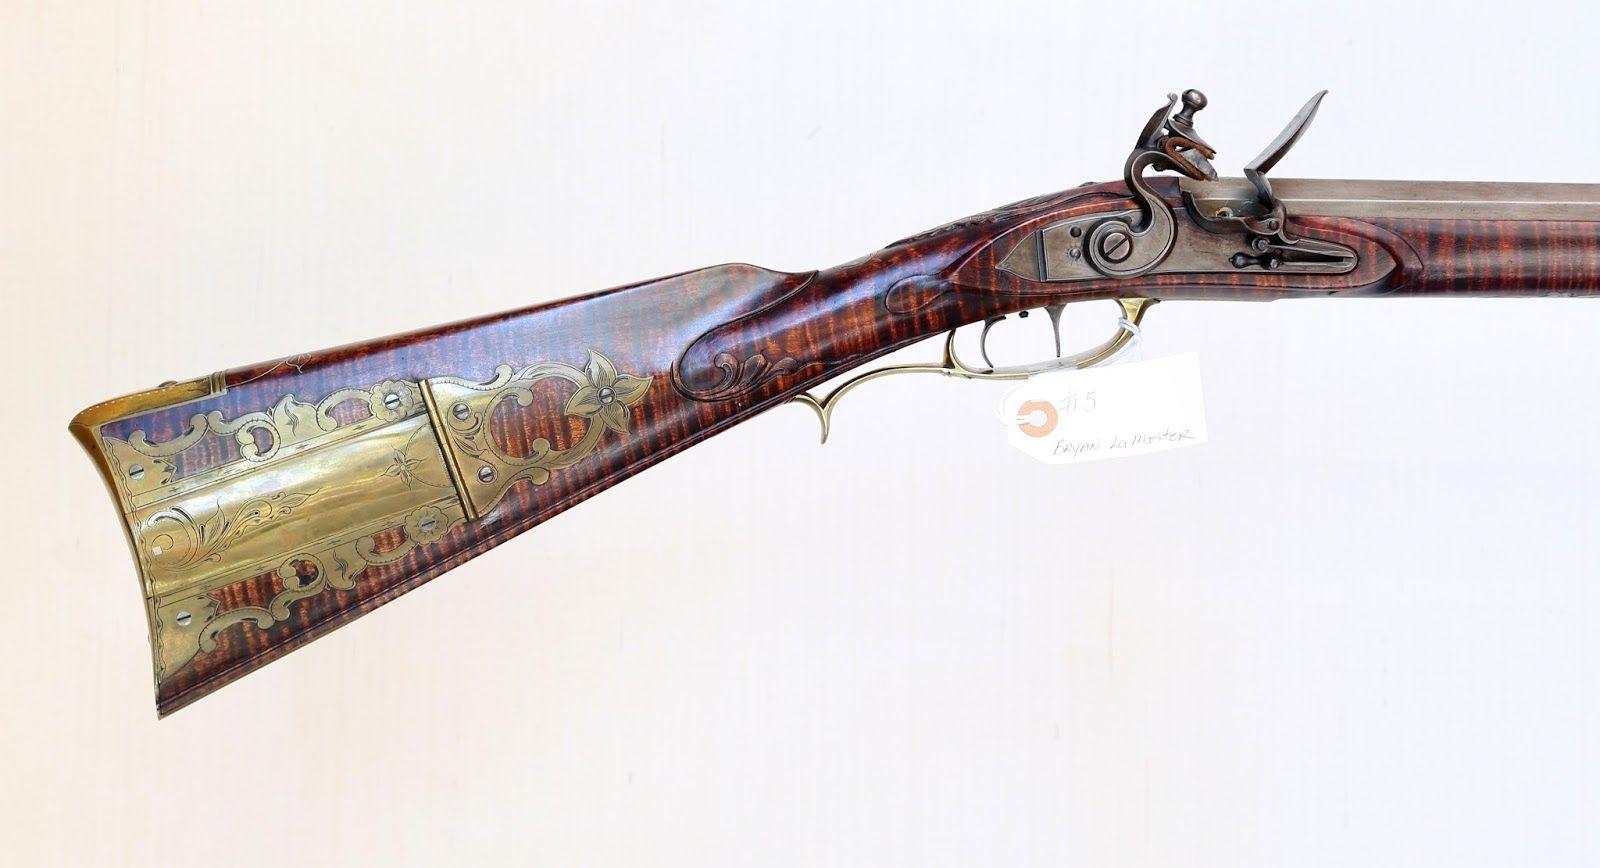 Contemporary Makers | the gun | Long rifle, Guns, Weapons